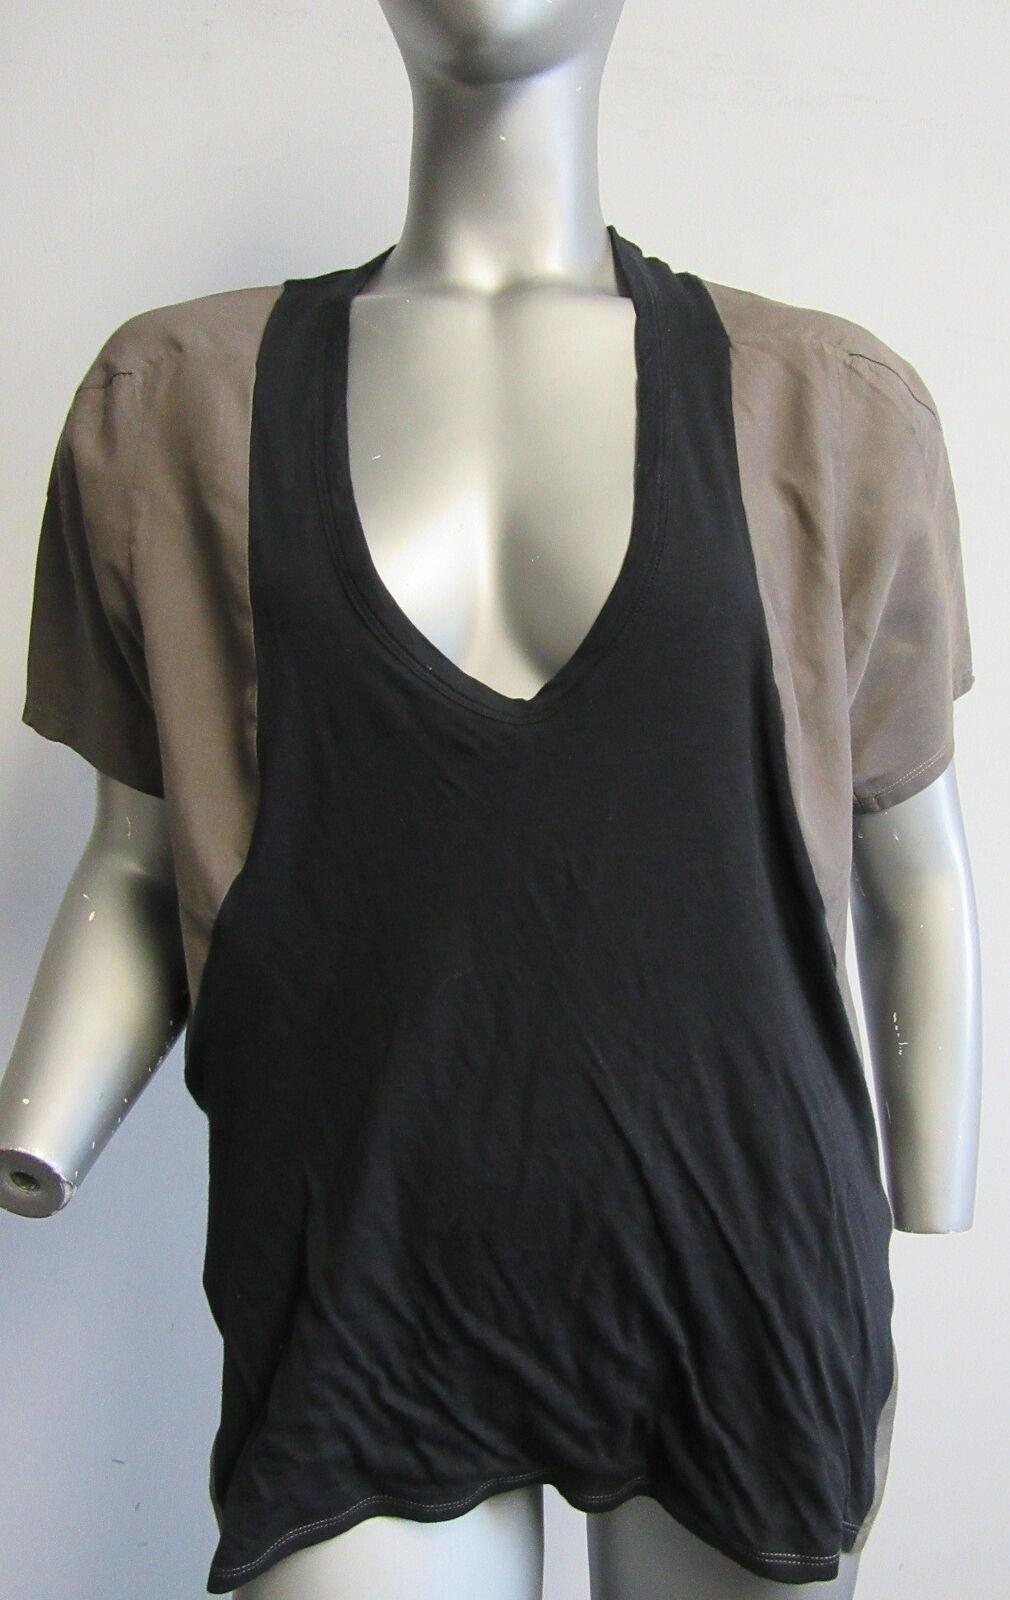 MARNI cotton voile & jersey grau & schwarz  plunging scoop neck top sz 44